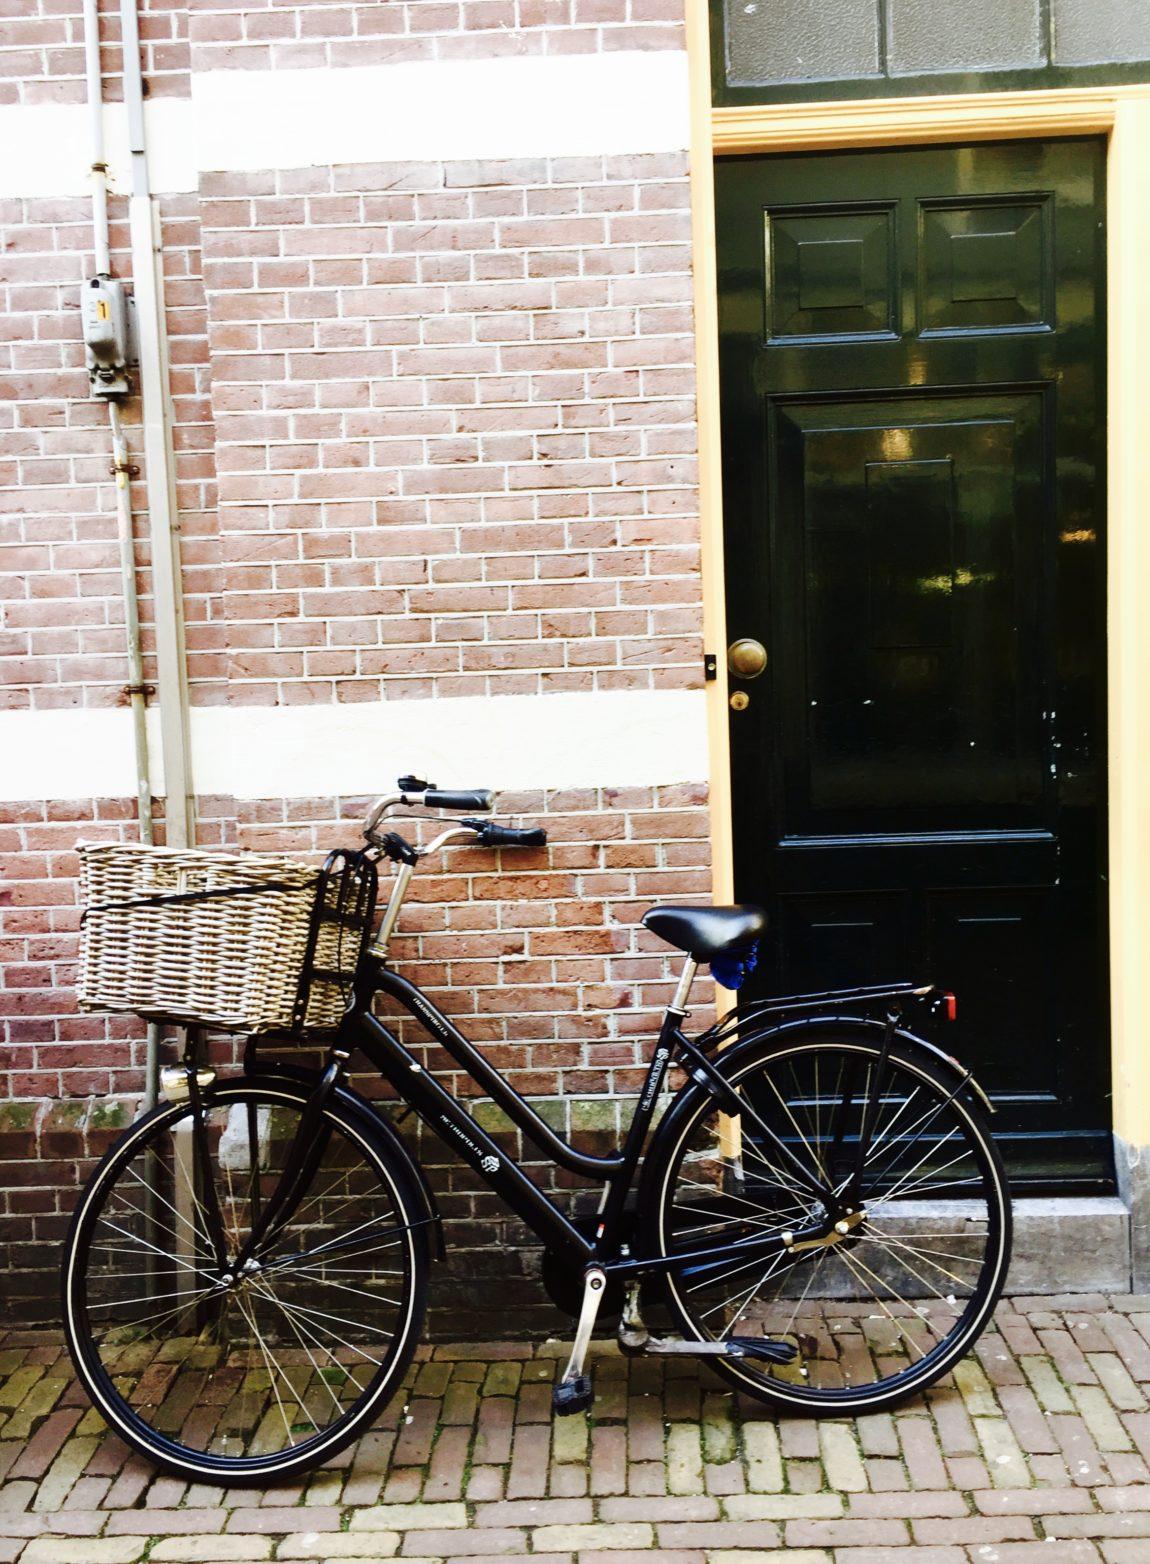 Alkmaar, Holland, Rad, Badepraline on tour, Reisen, Reiseblog, Frühlingbitte-Naturseifen, Badepraline, Duschriegel , Duschcreme, Rosenblütenbadesalz